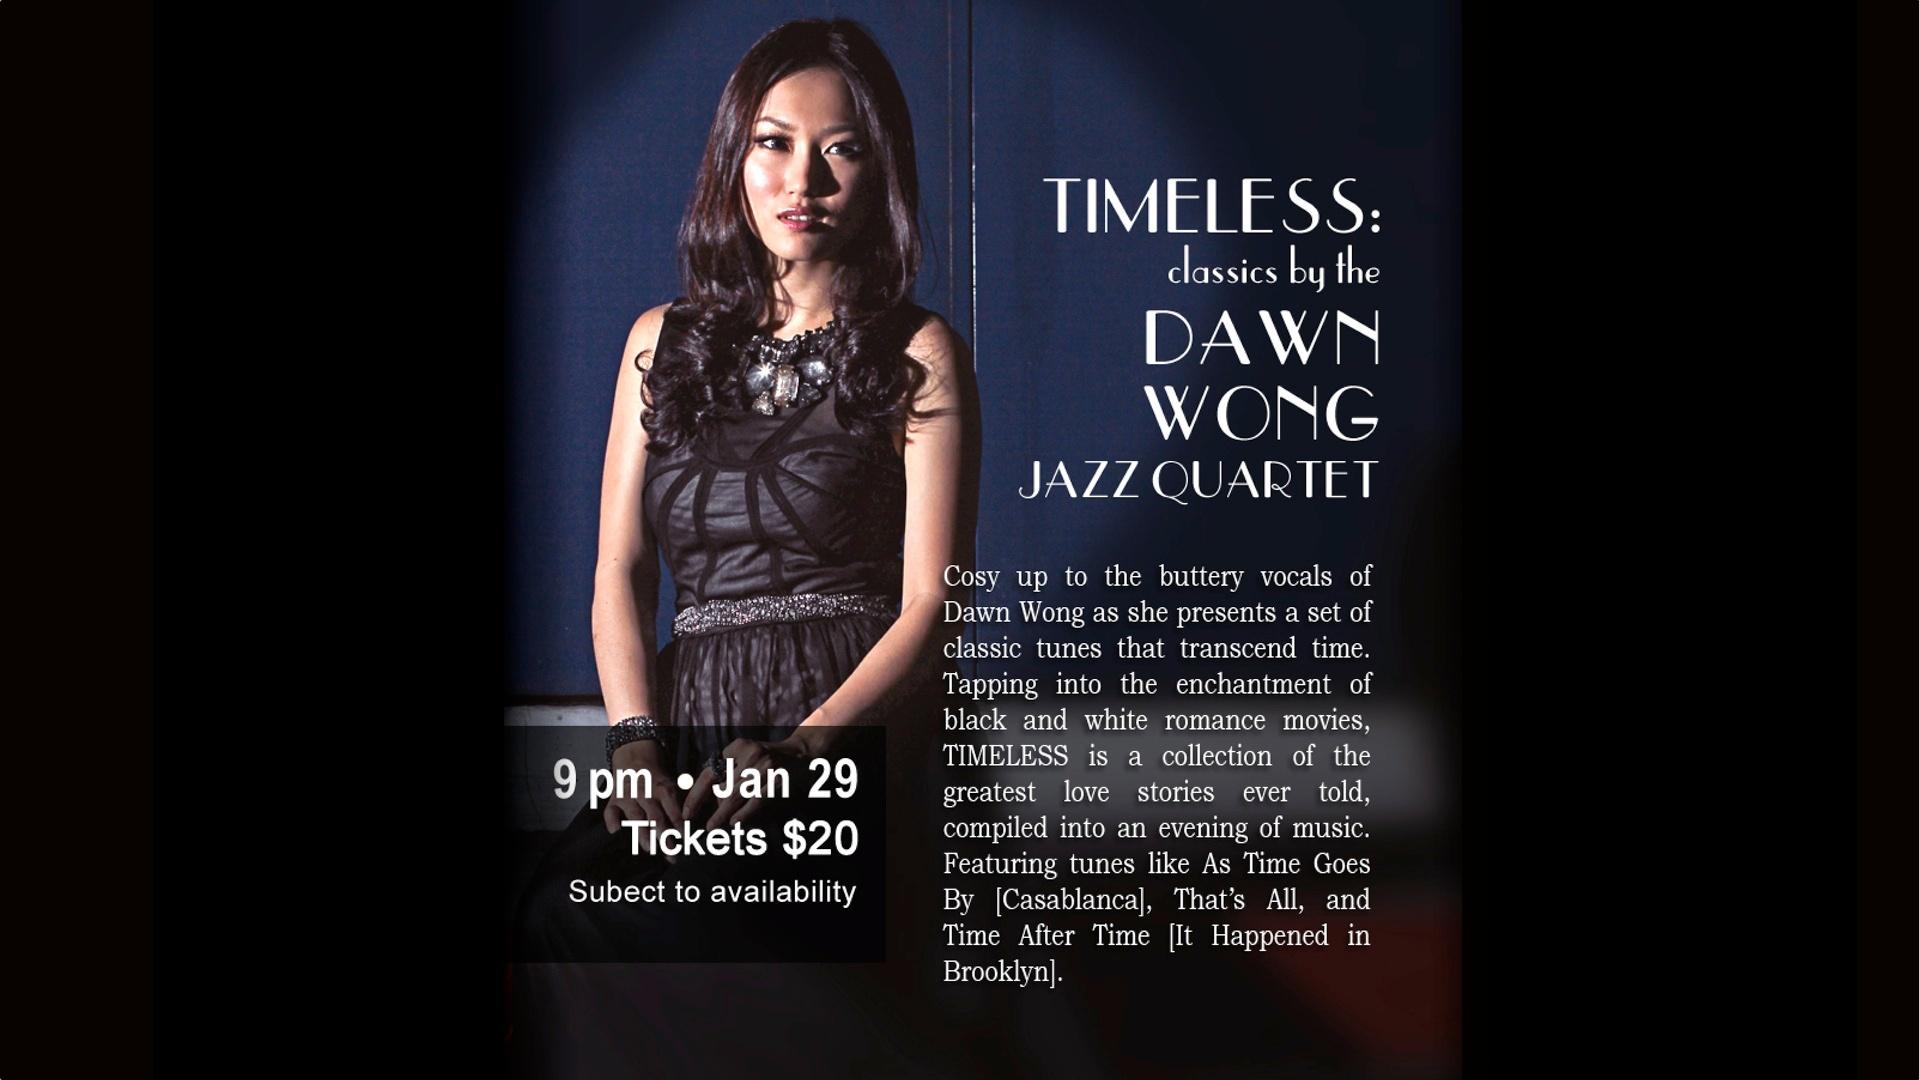 Dawn Wong Jazz Quartet